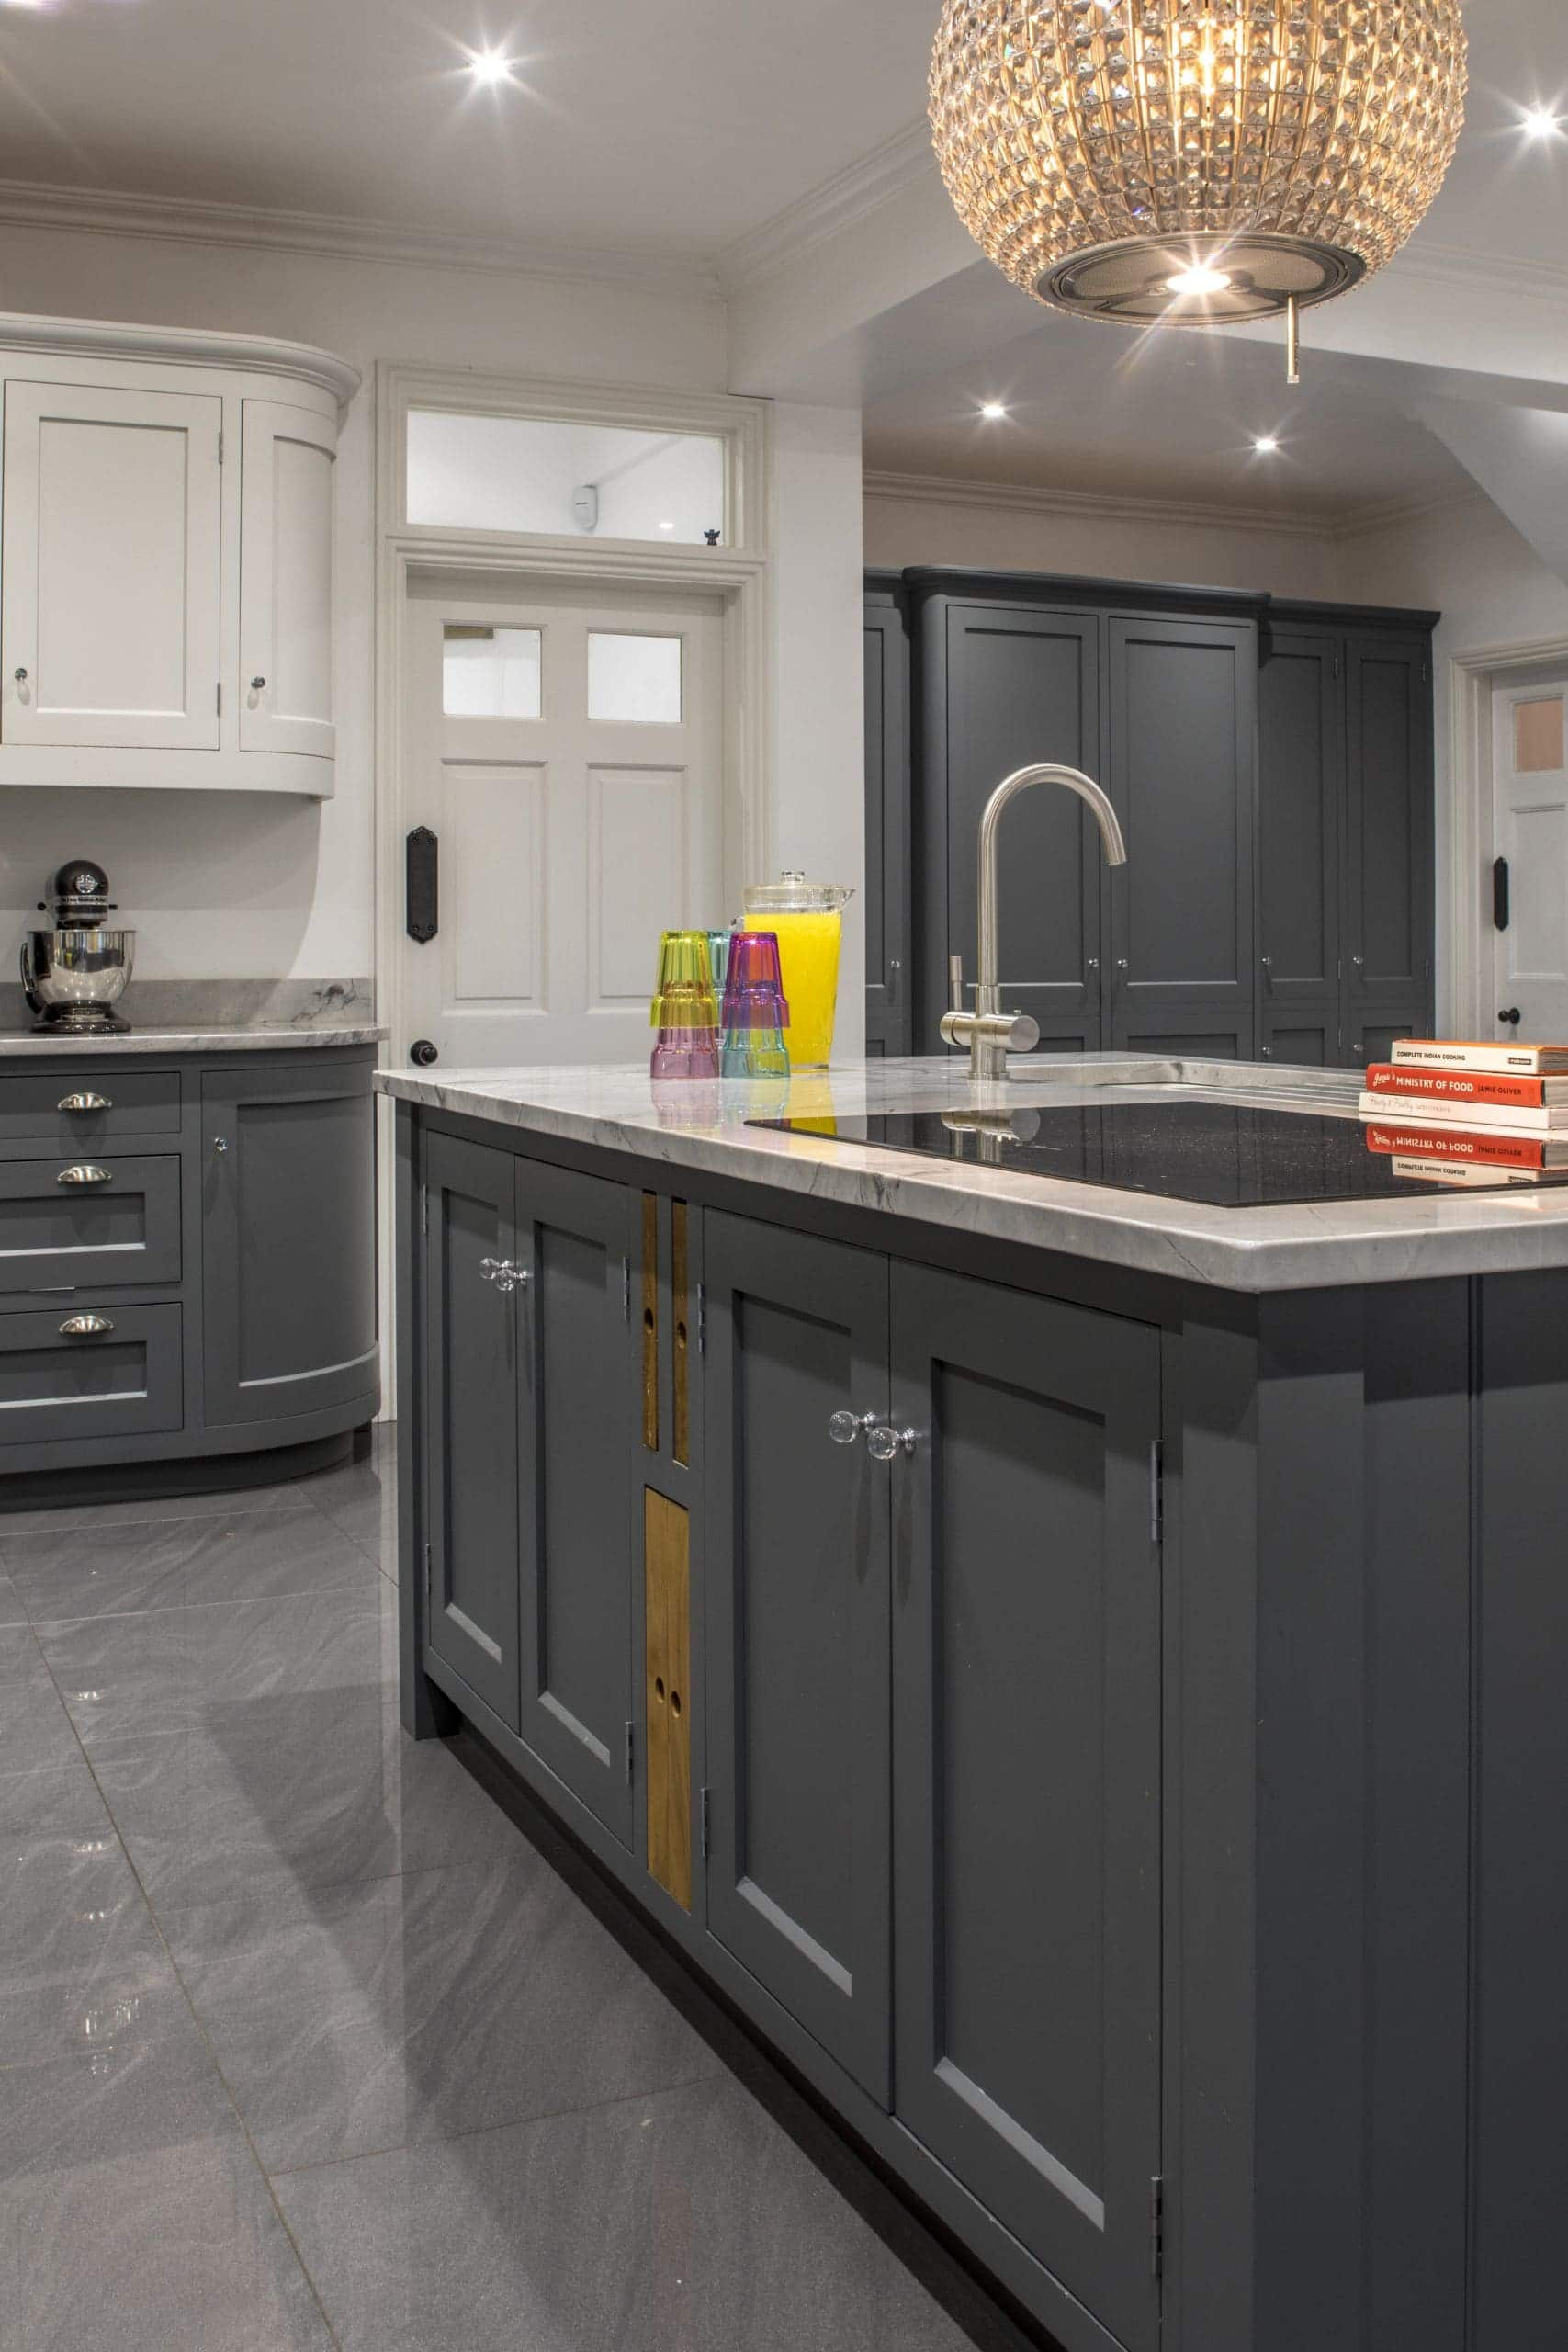 A beautiful, bespoke kitchen with a glass light shade